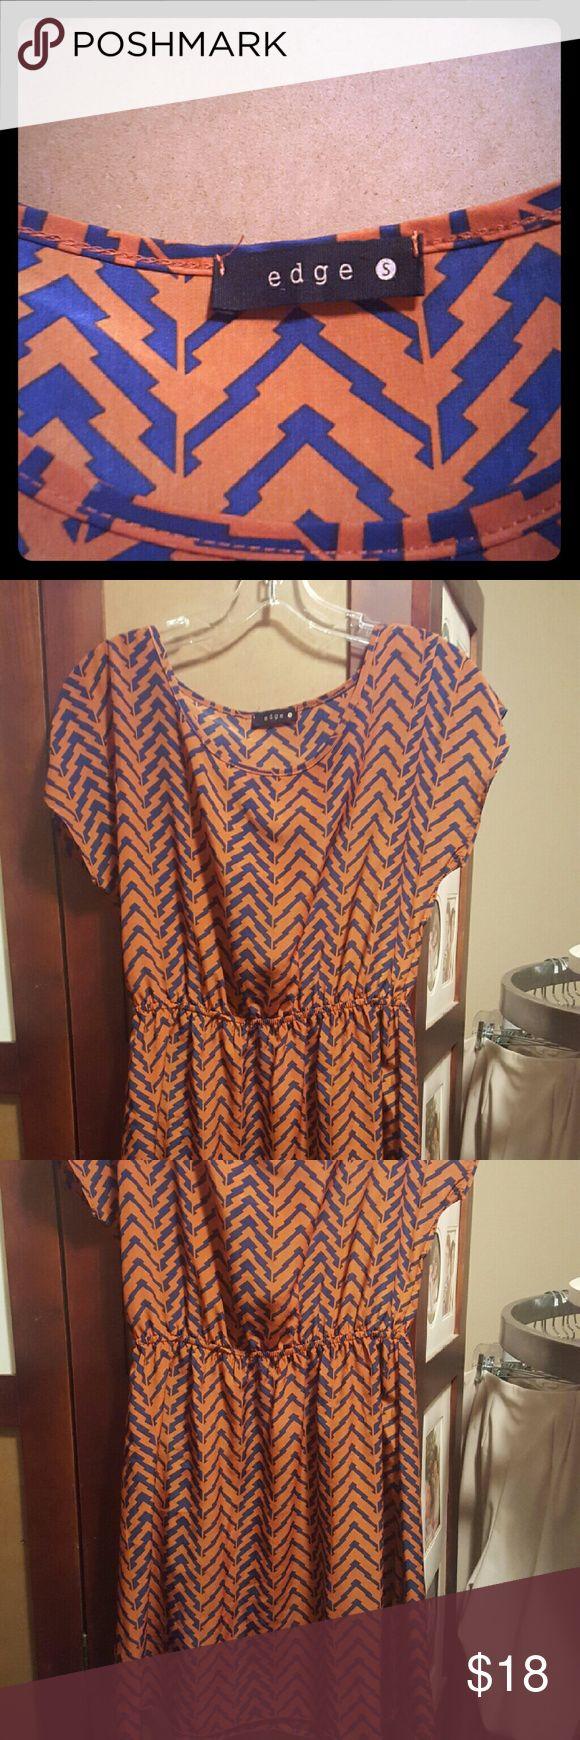 Women's clothing Tribal print edge Dresses Midi